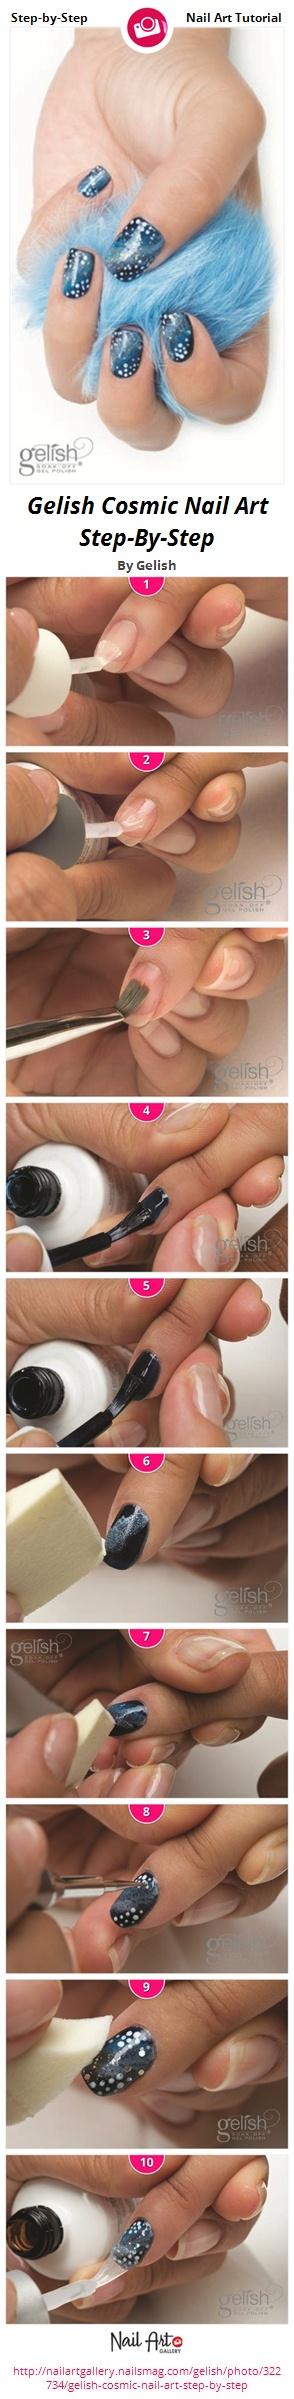 Gelish Cosmic Nail Art Step-By-Step - Nail Art Gallery